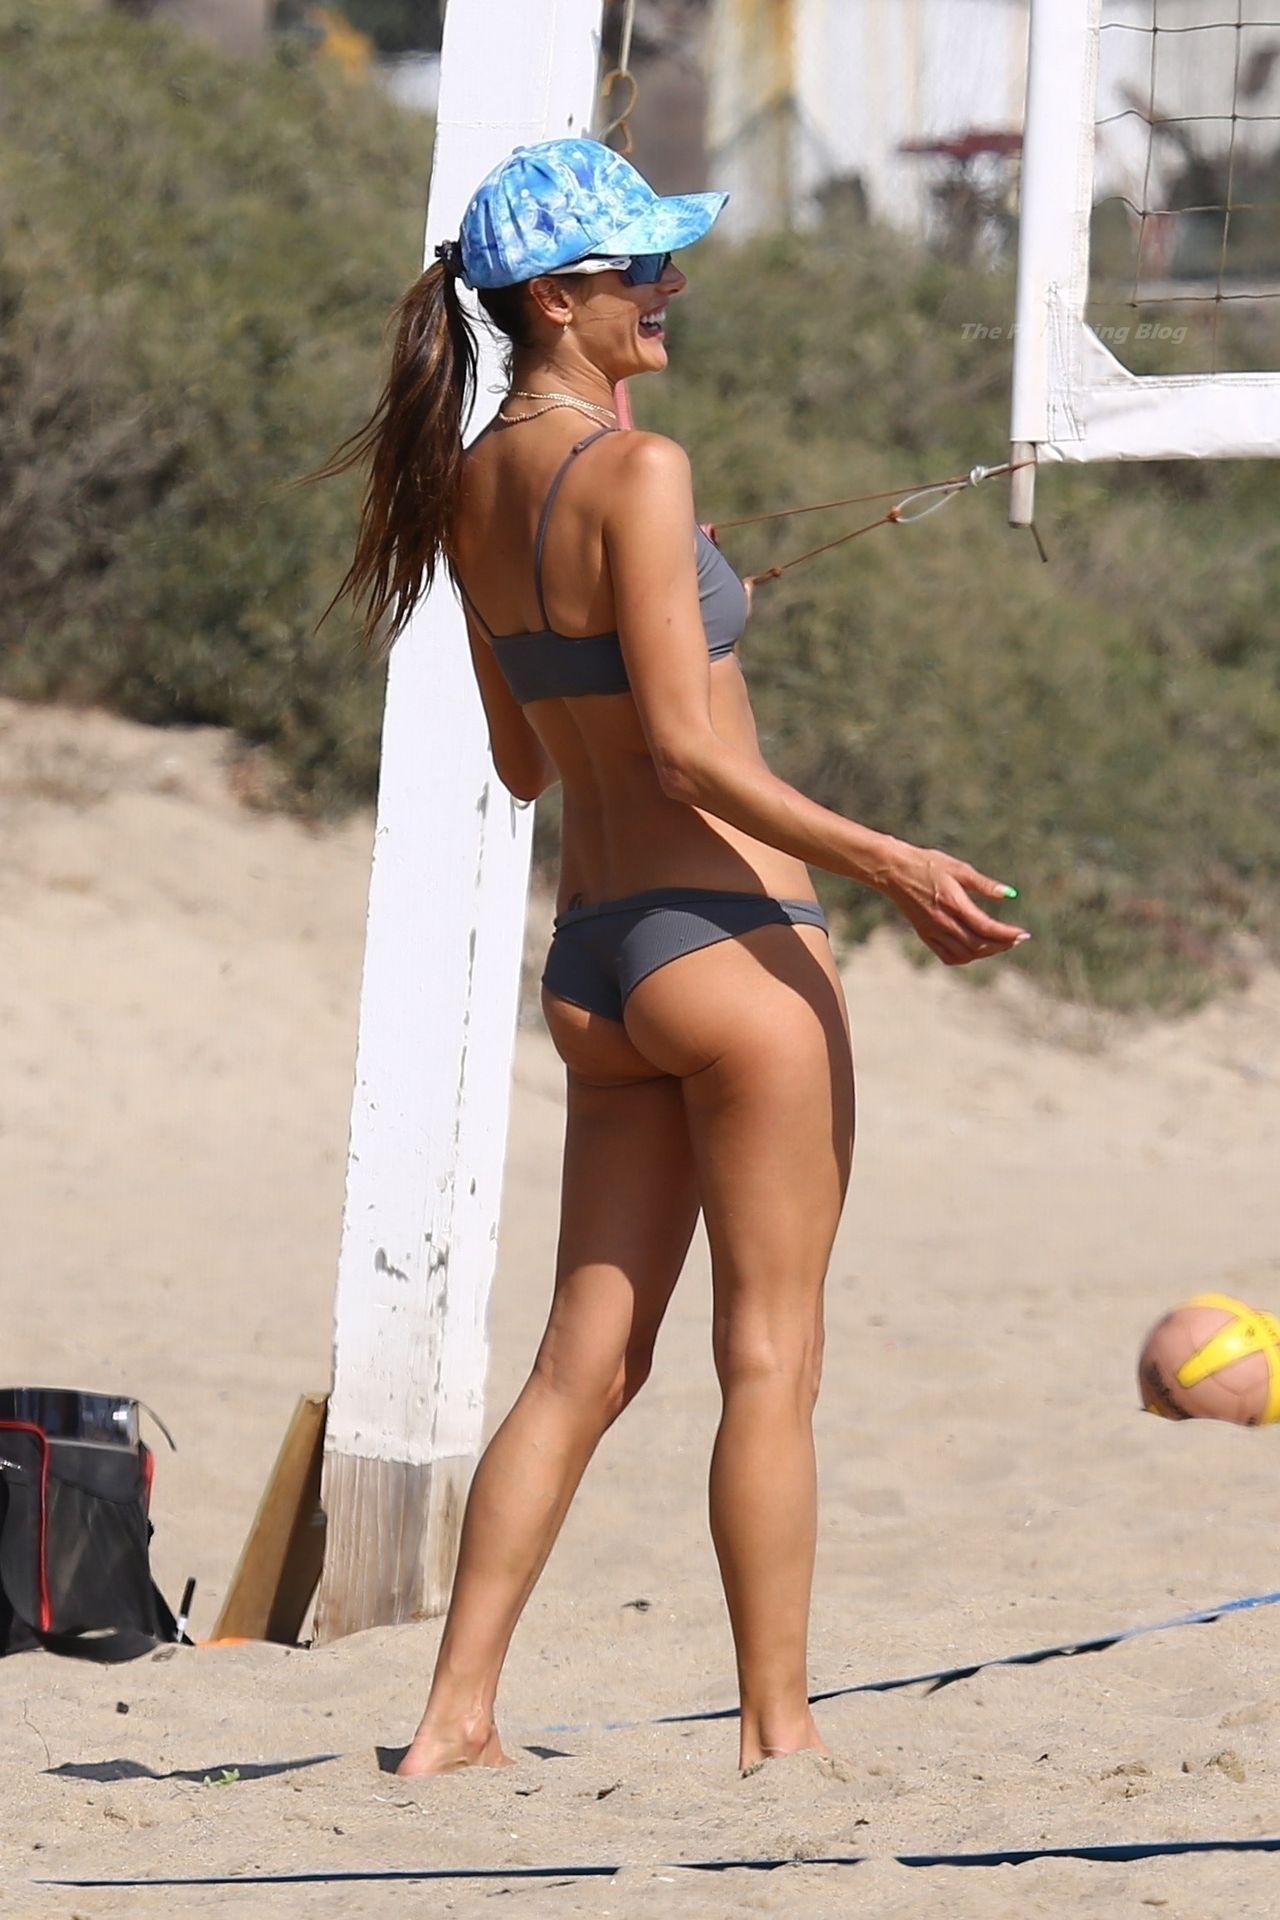 Alessandra-Ambrosio-Sexy-The-Fappening-Blog-18-3.jpg